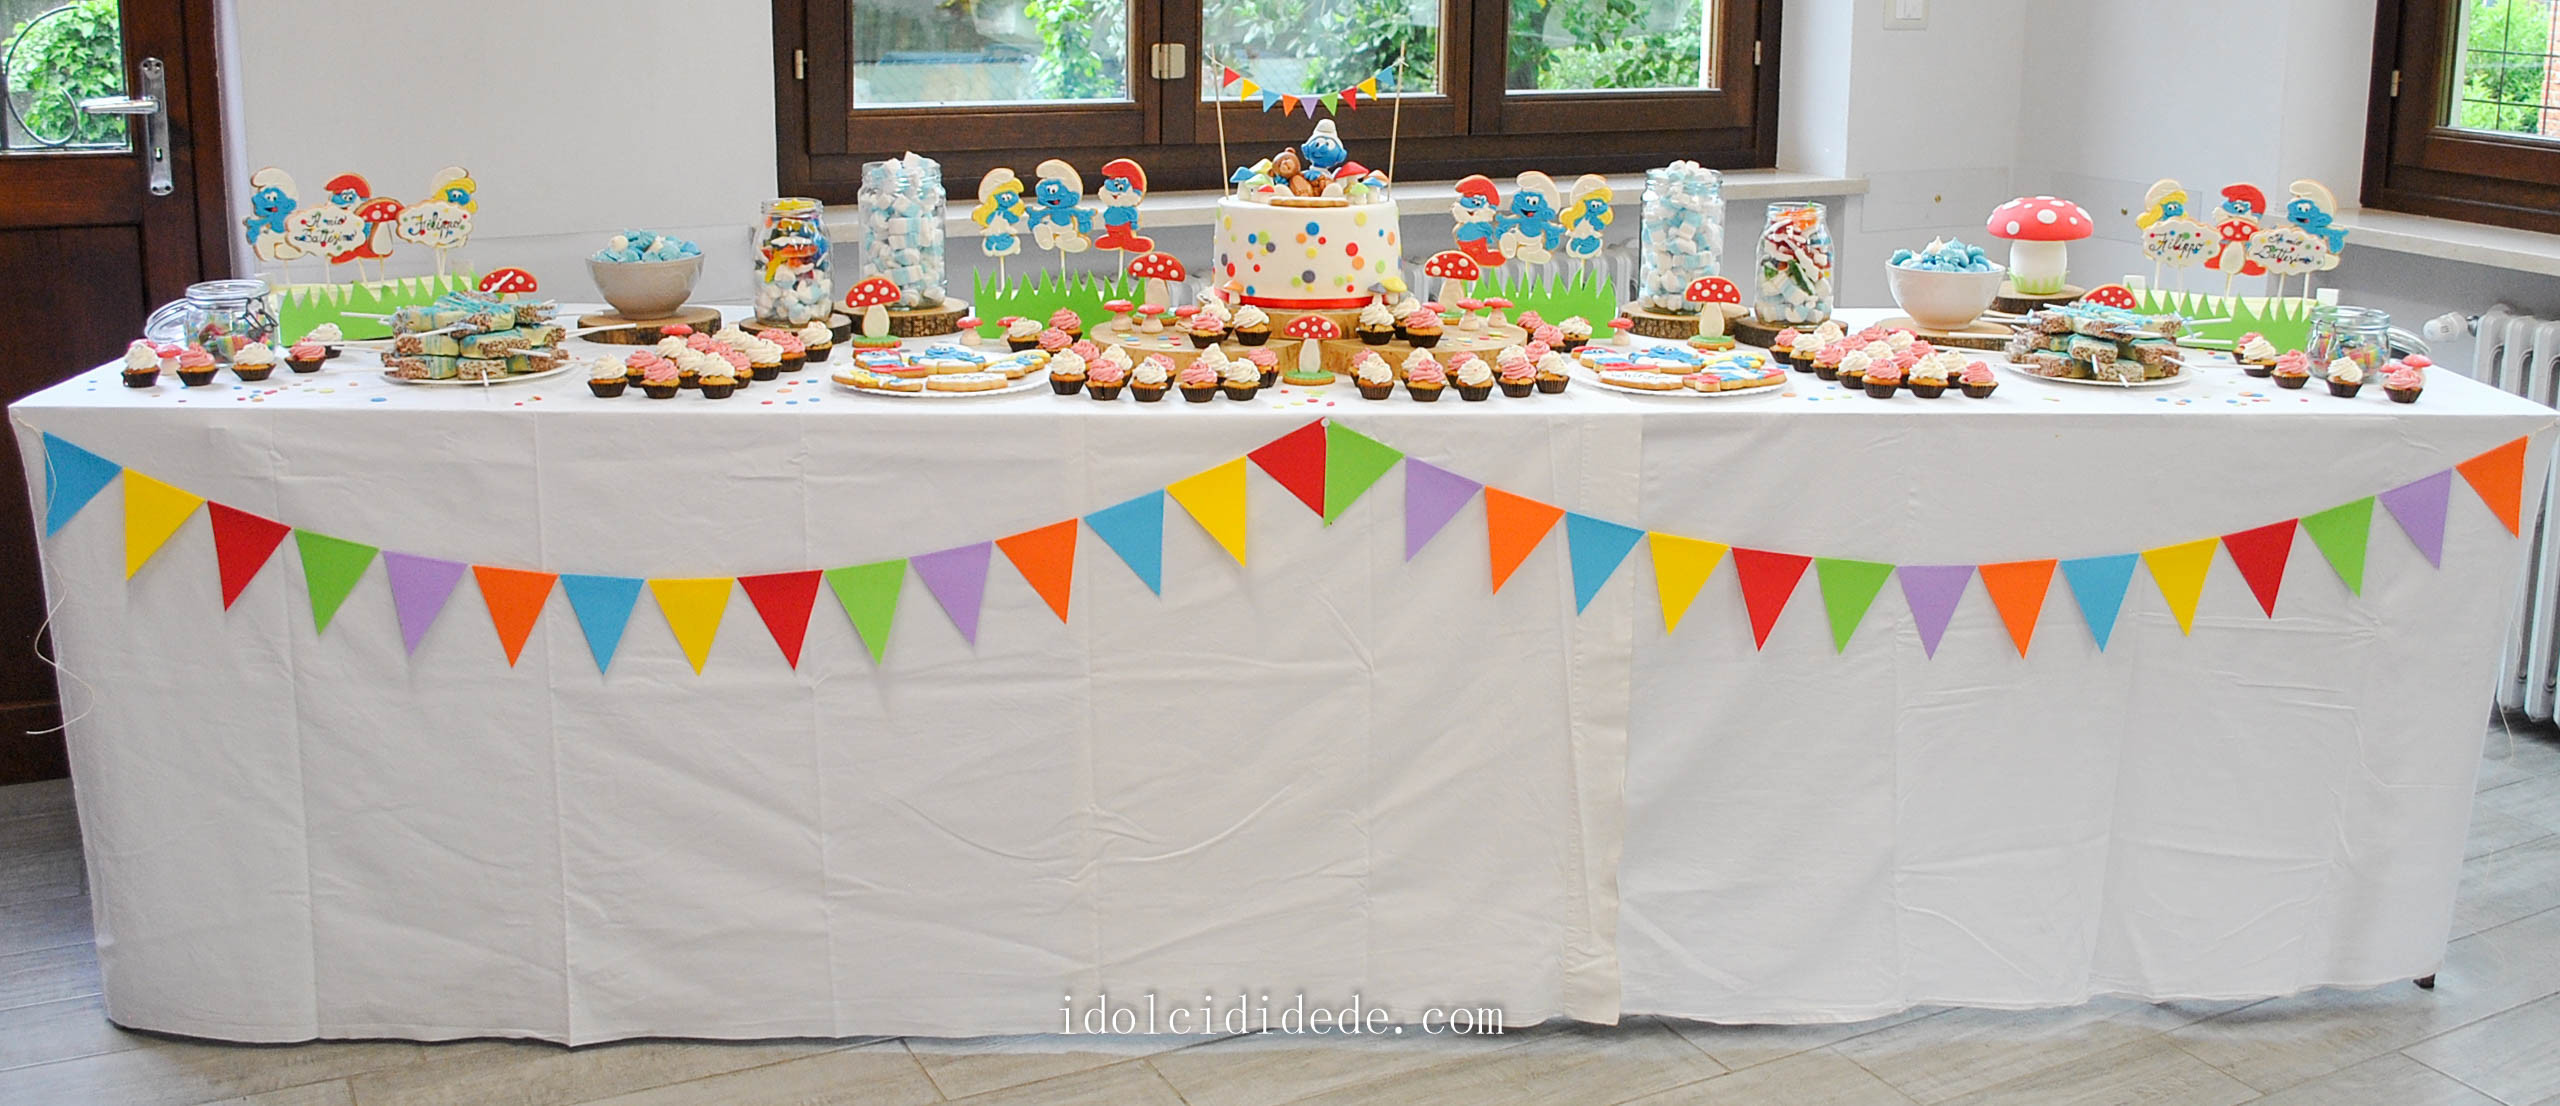 La sweet table